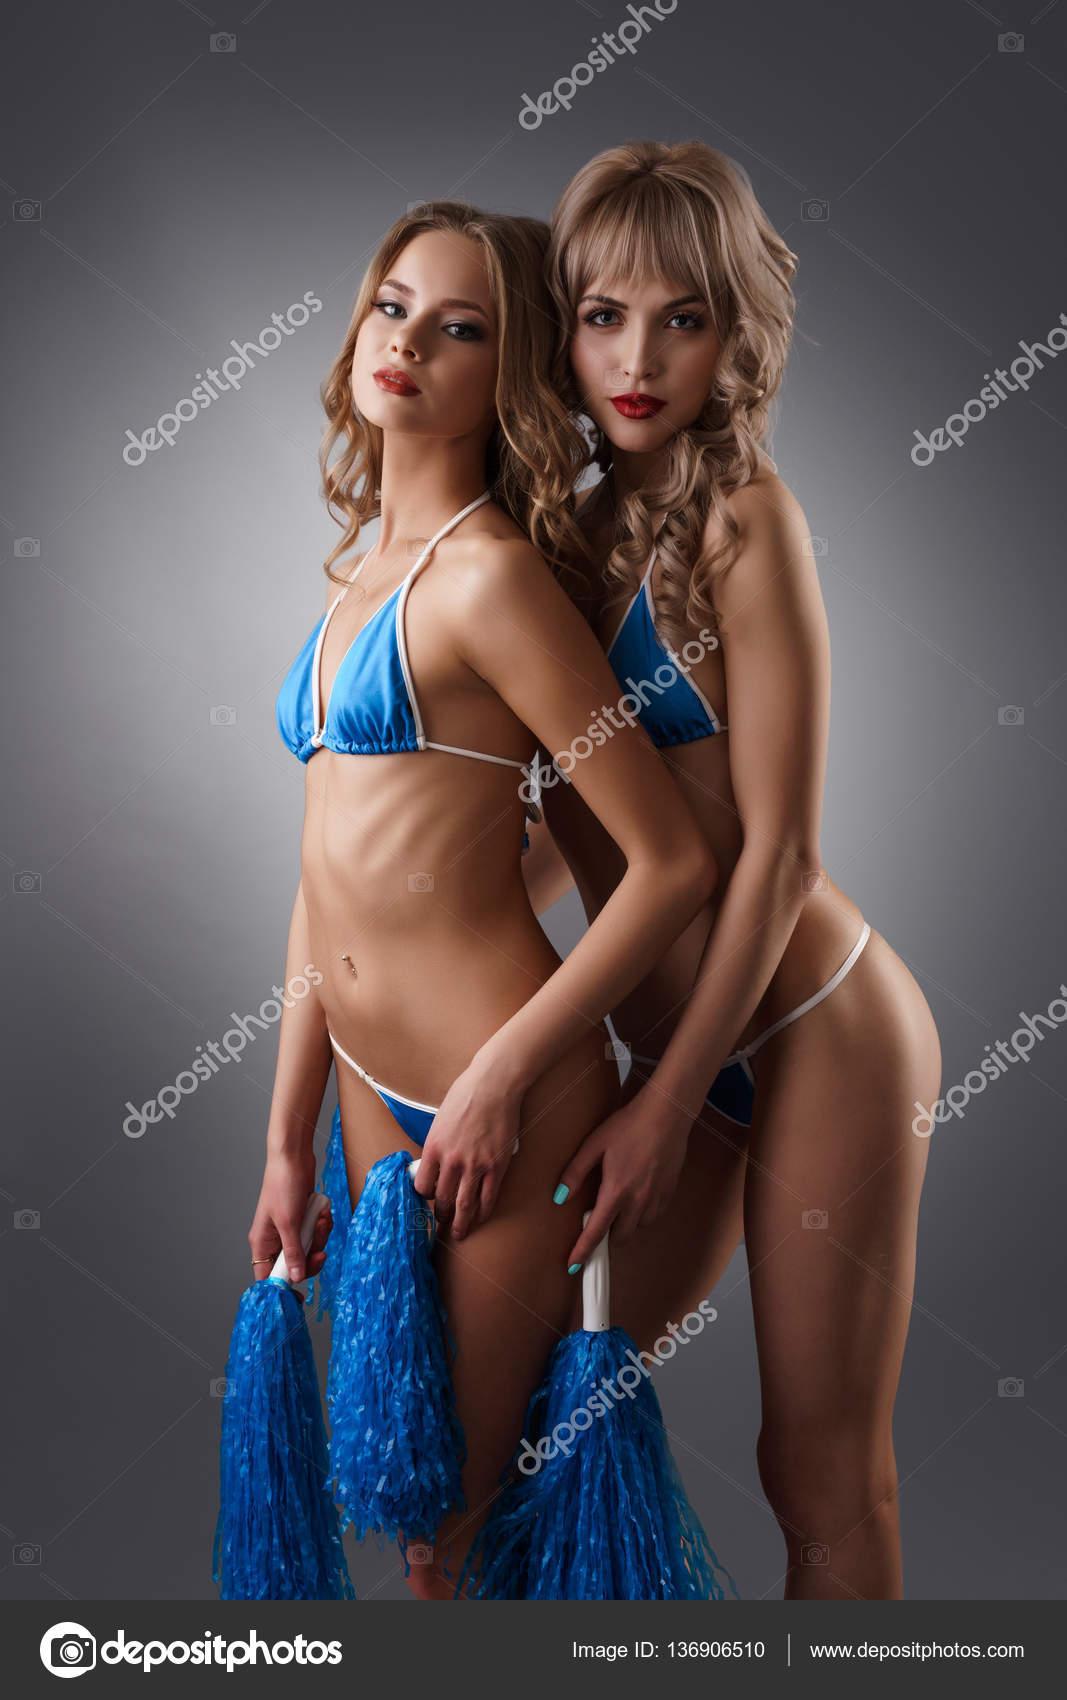 sexiga tjejer i bikini svesnk